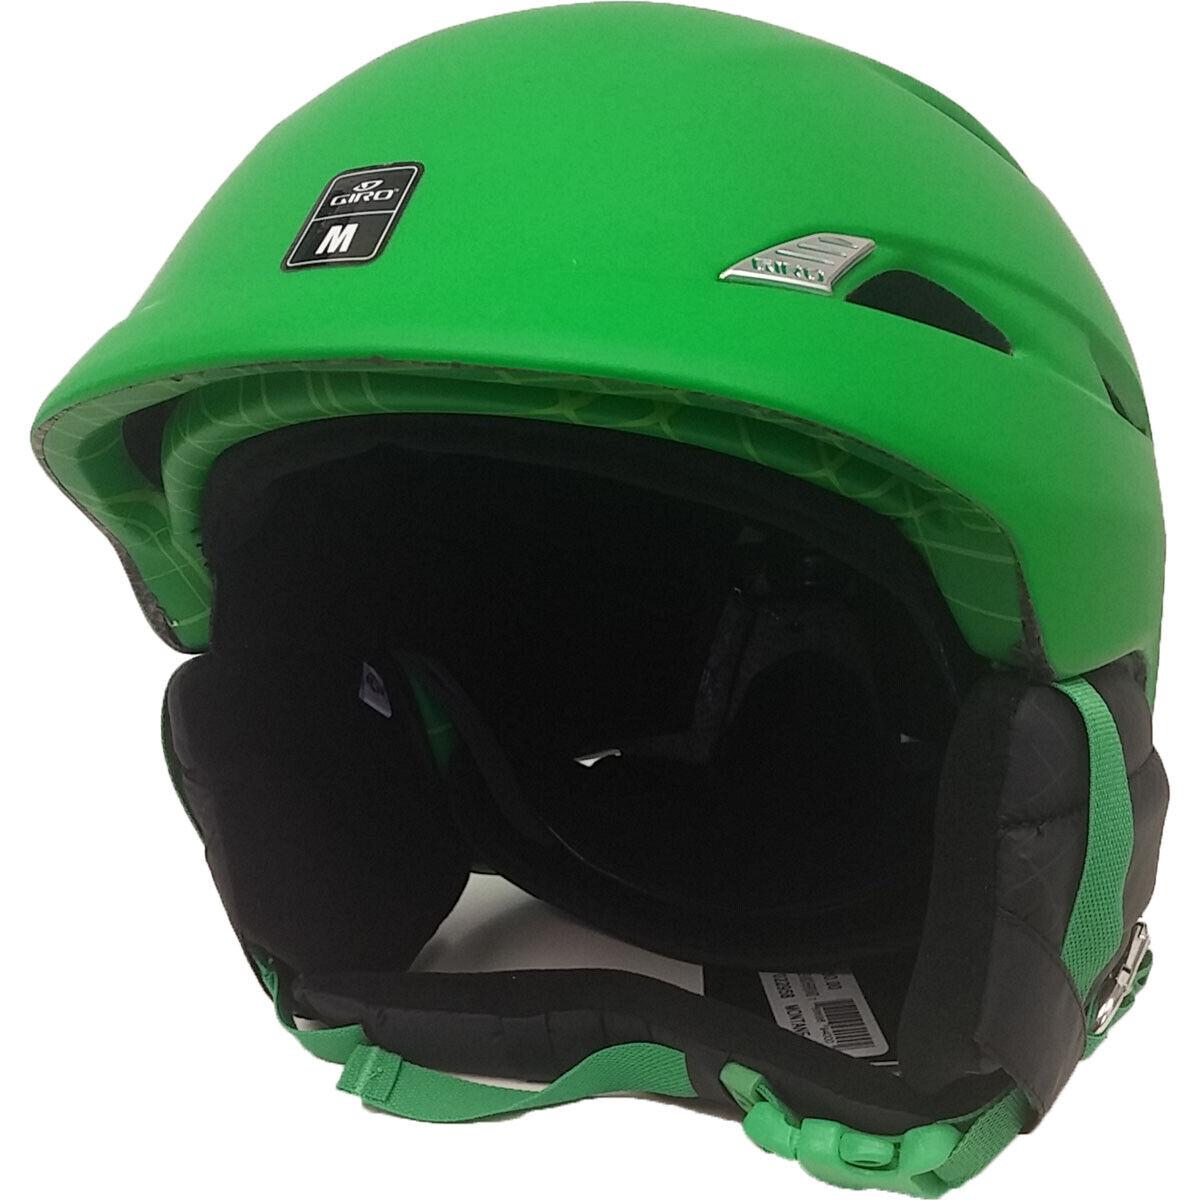 Giro Montane Snow Sports Helmet Mat Green Motherboard Adult Medium M 55.5 59 cm